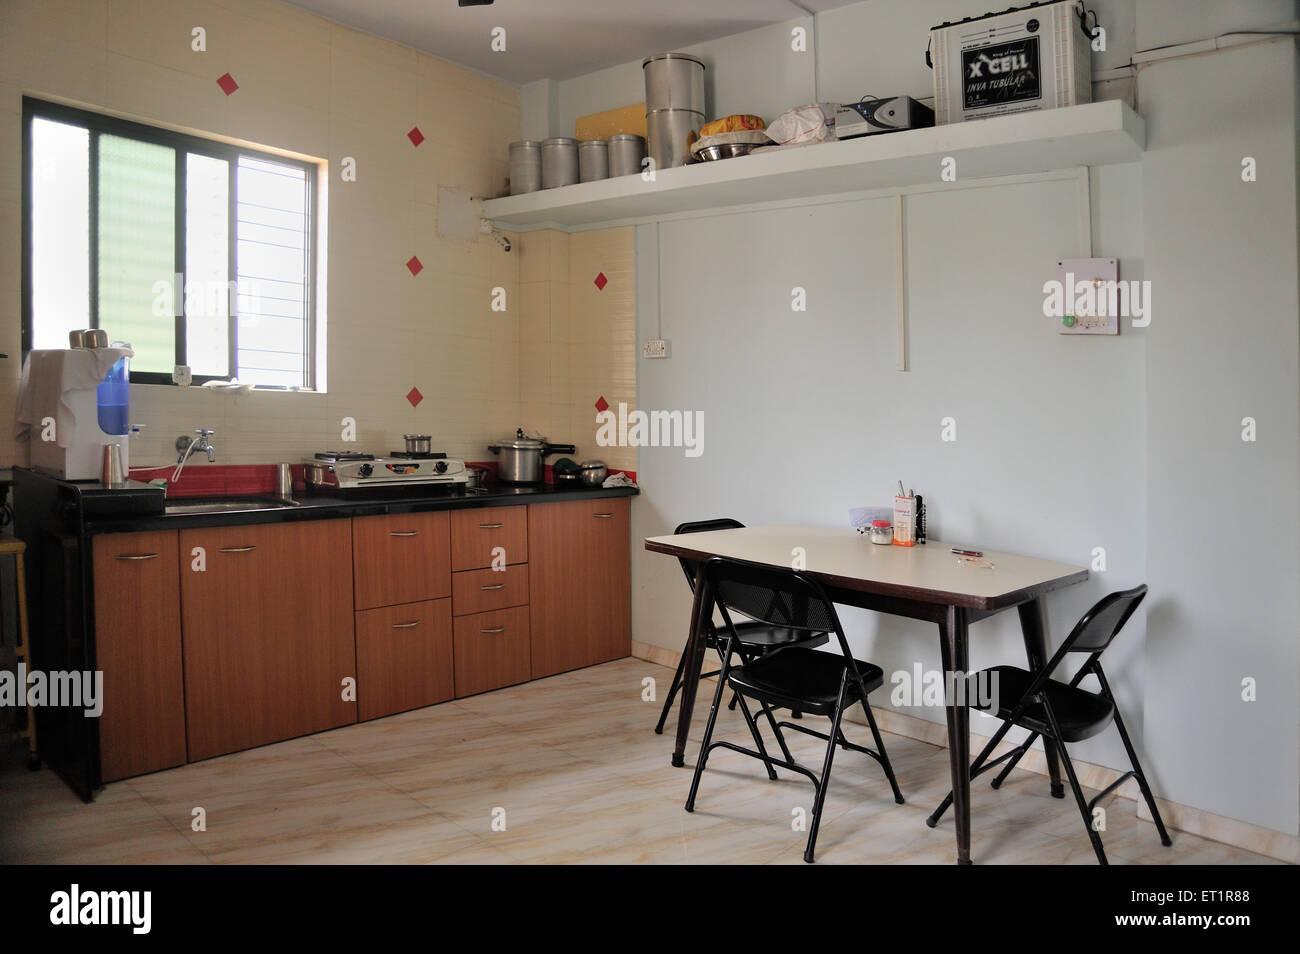 Kitchen In Nasik Home Maharashtra India Asia Stock Photo Alamy